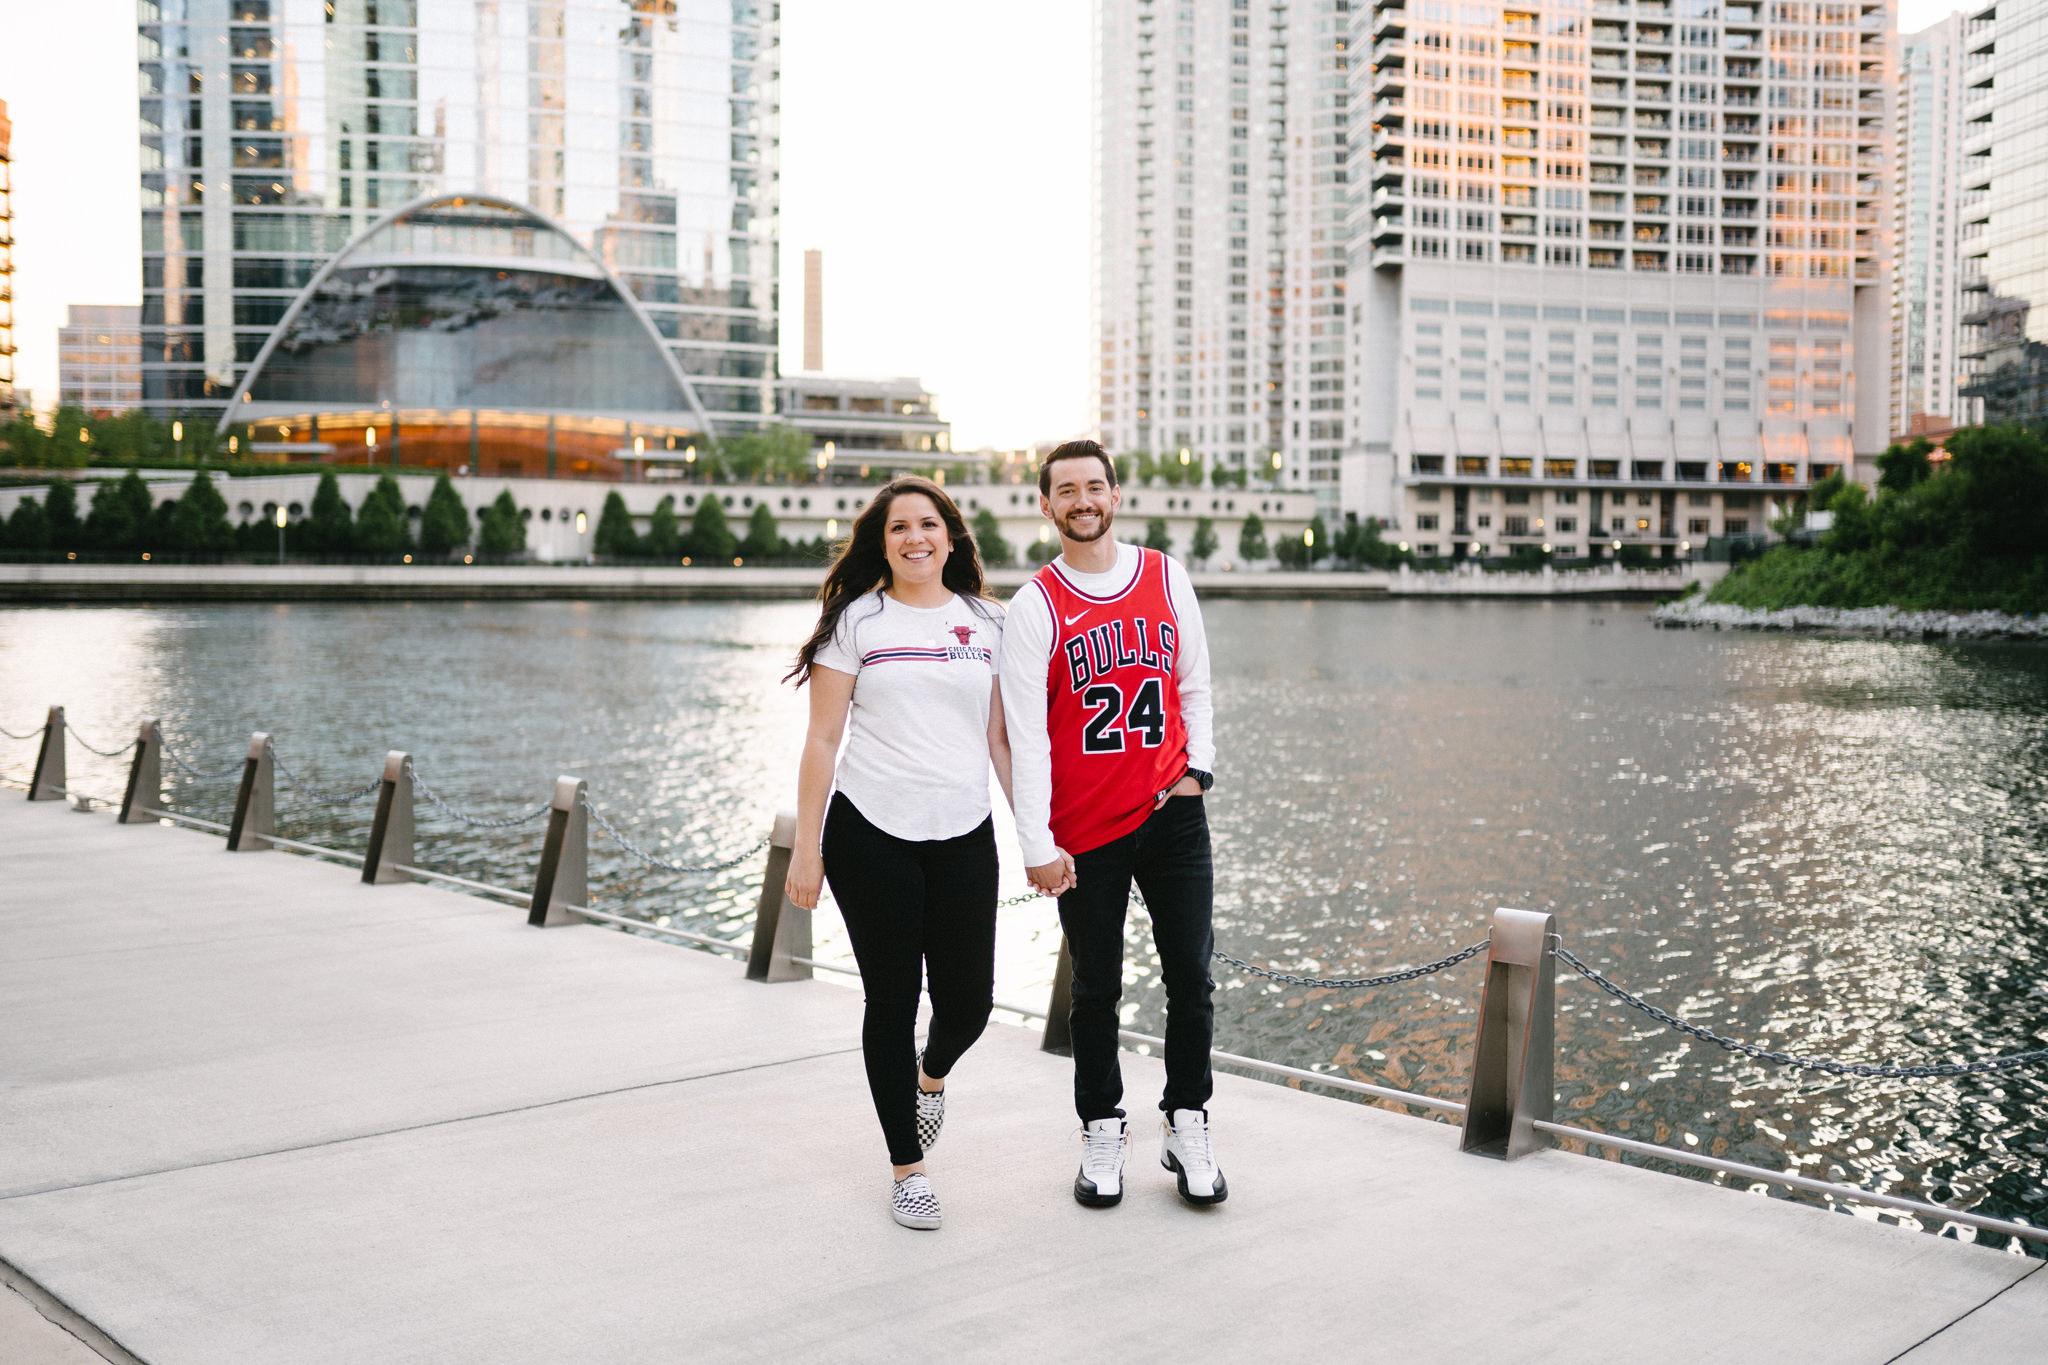 015-rempel-photography-chicago-wedding-inspiration-matt-mariana-riverwalk-engagement-session-city-view-loft-ohana-events.jpg